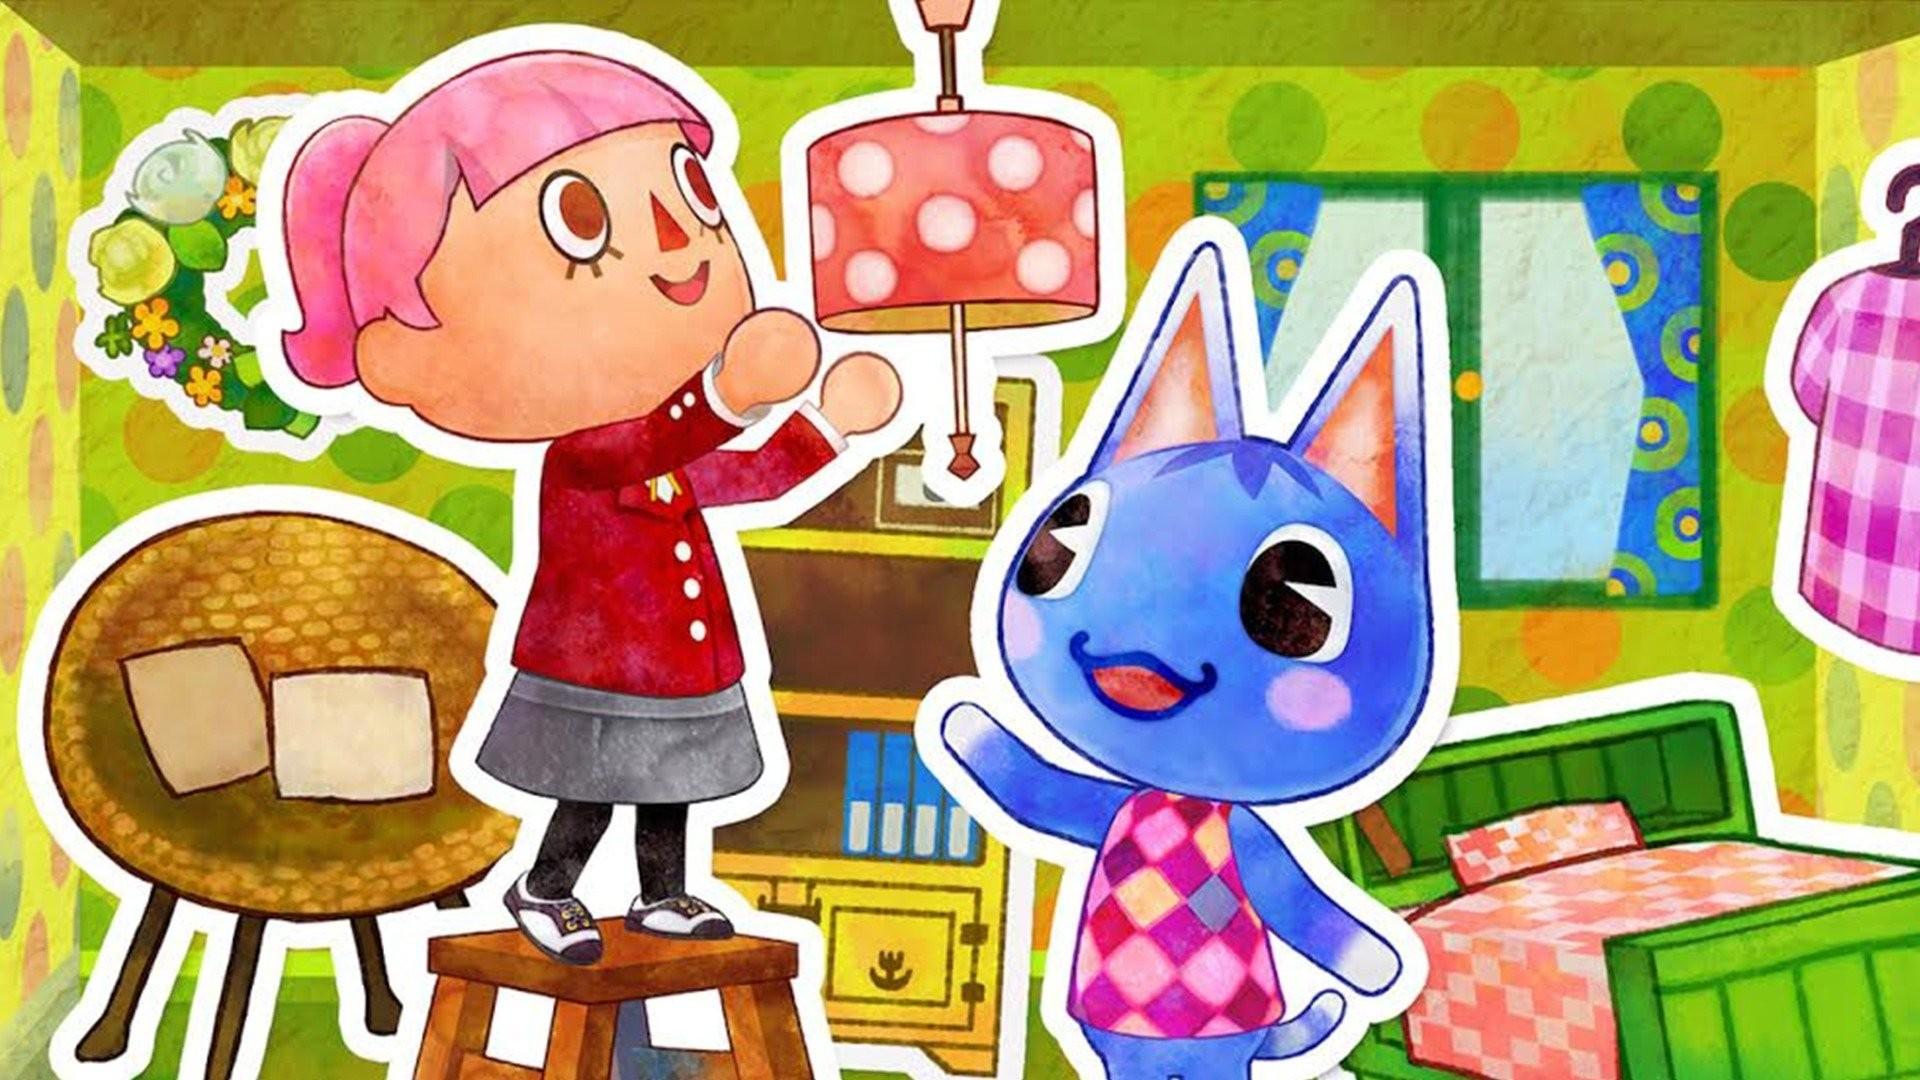 Video Game – Animal Crossing Wallpaper